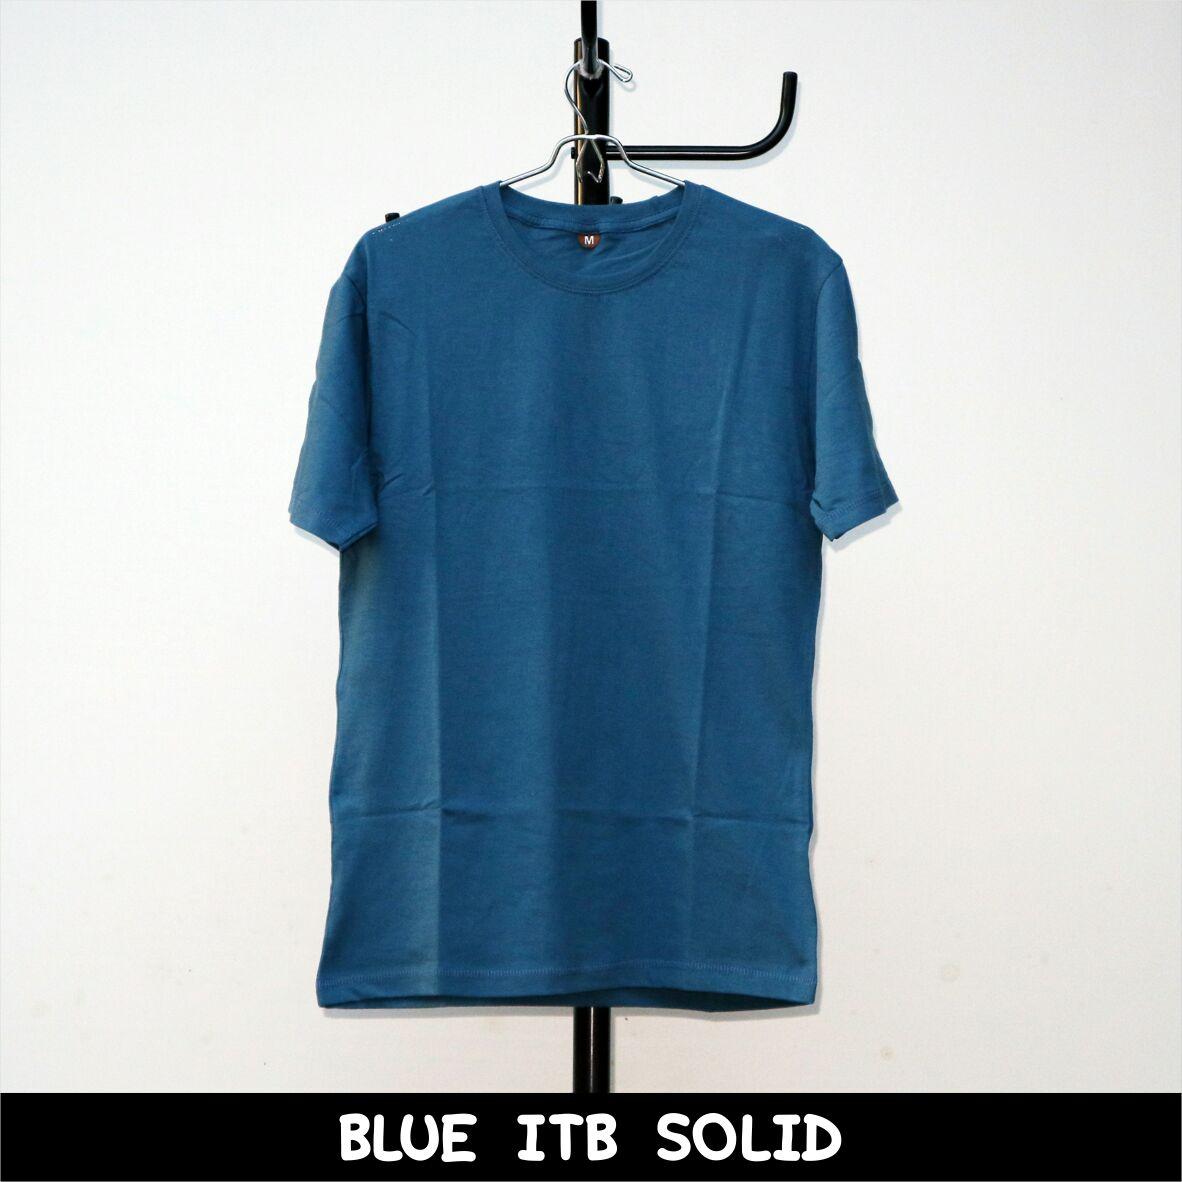 Kaos Polos Premium Shop Line Maroon Triton Blue Itb